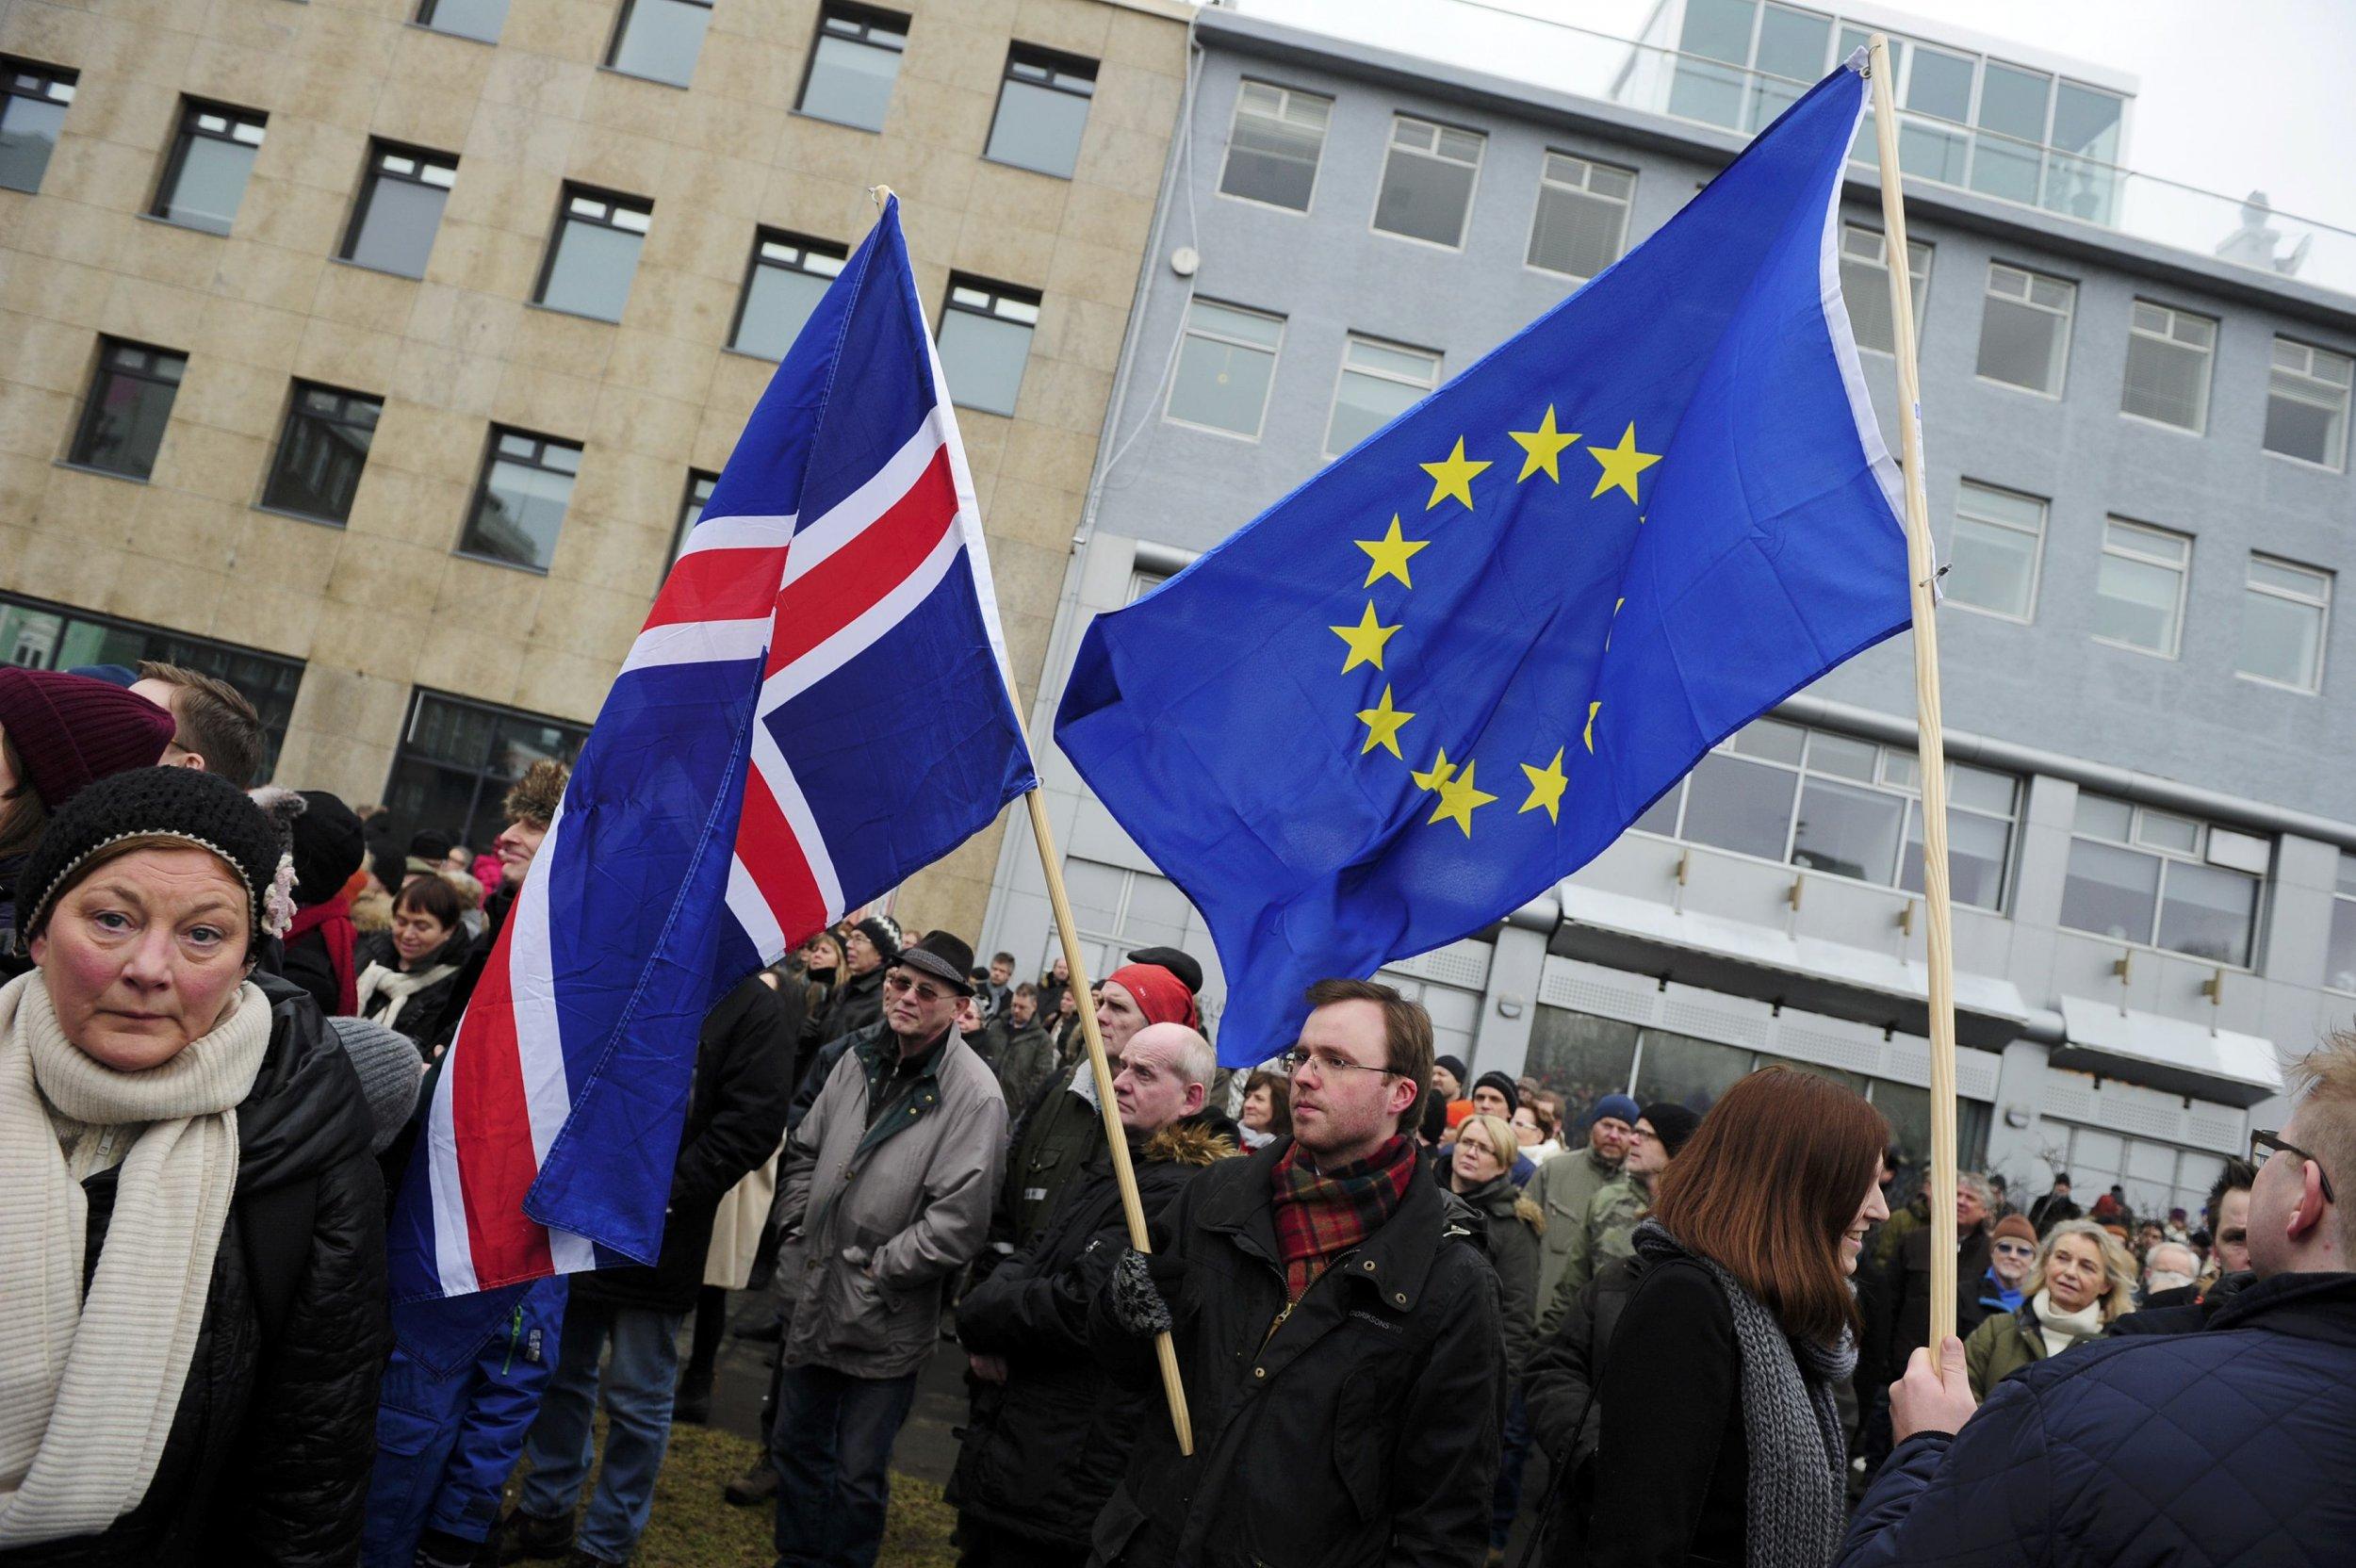 2015-03-15T150140Z_133758857_LR2EB3F15QHQT_RTRMADP_3_ICELAND-EU-PROTEST